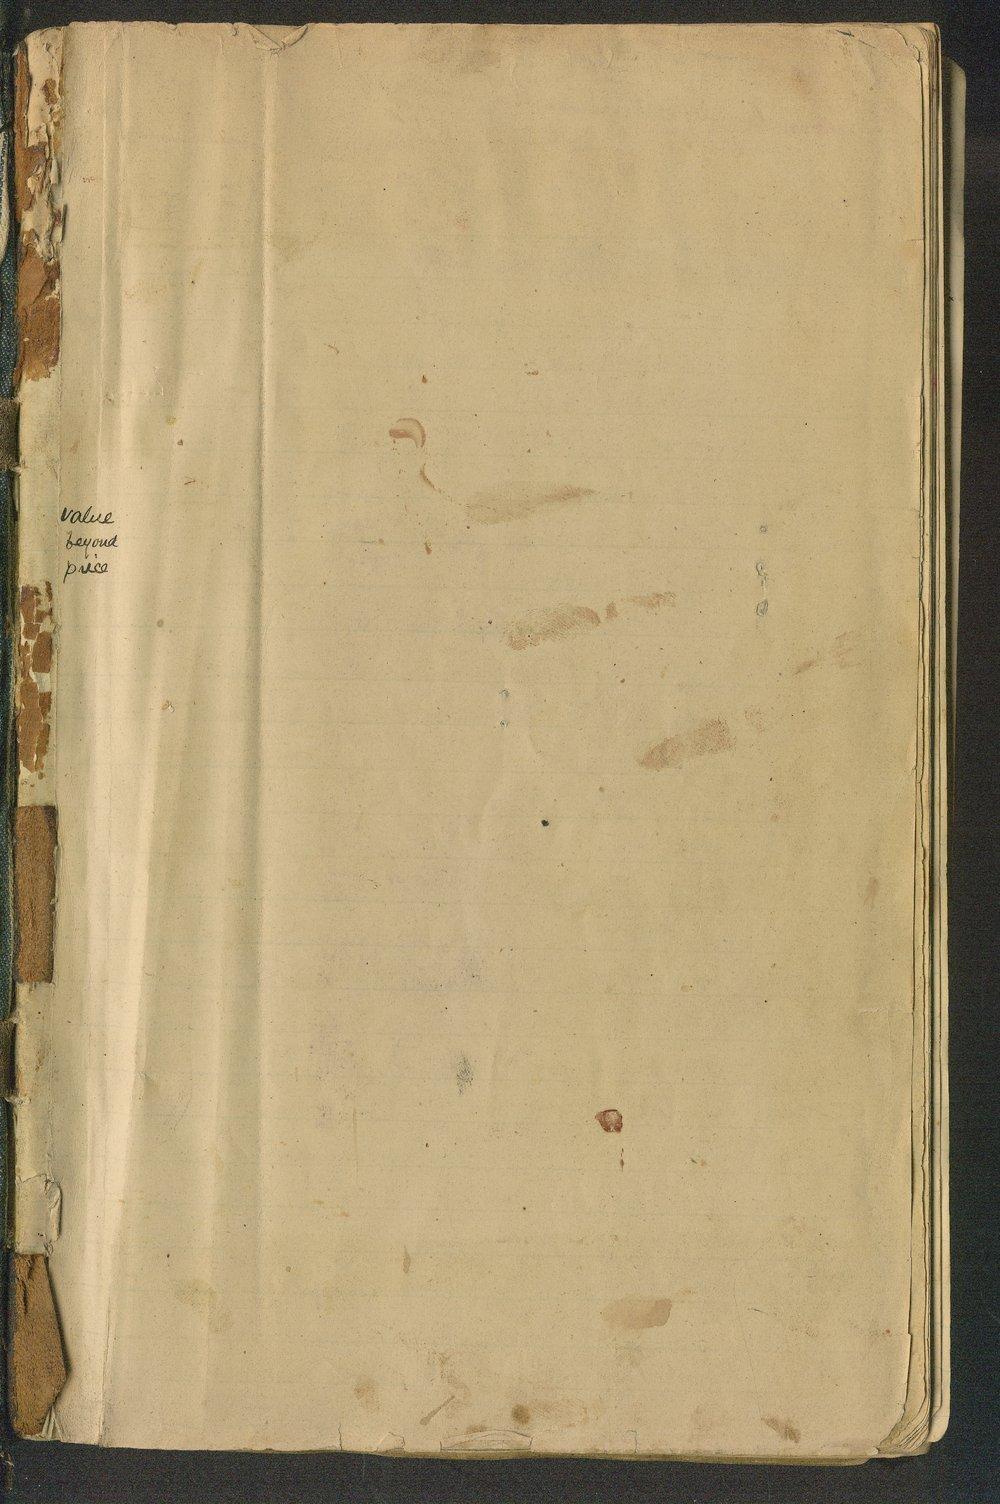 Samuel Reader's diary, volume 6 - Frontispiece